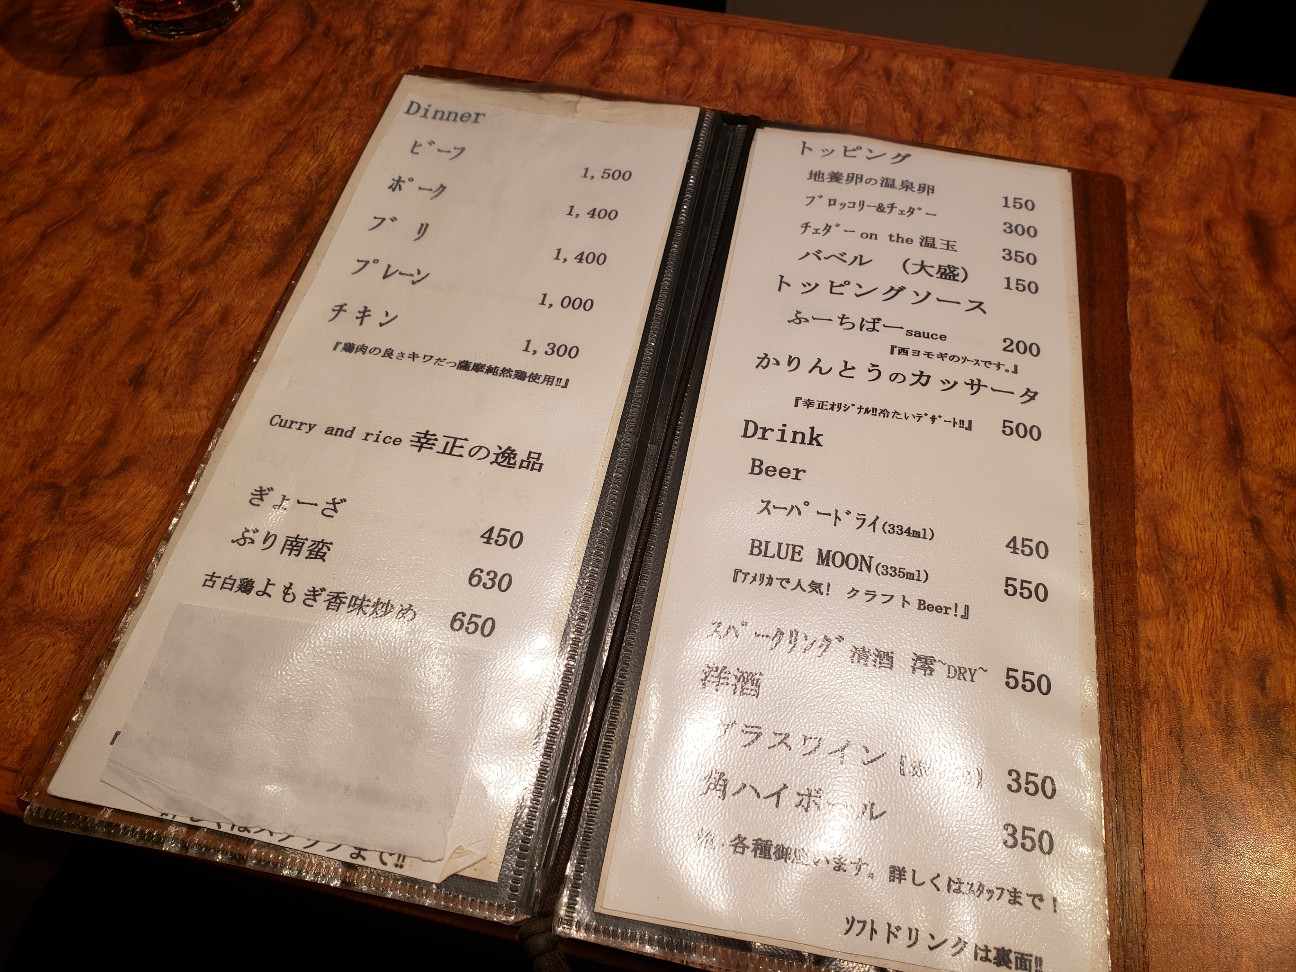 f:id:tt-suzukiit:20201217191021j:image